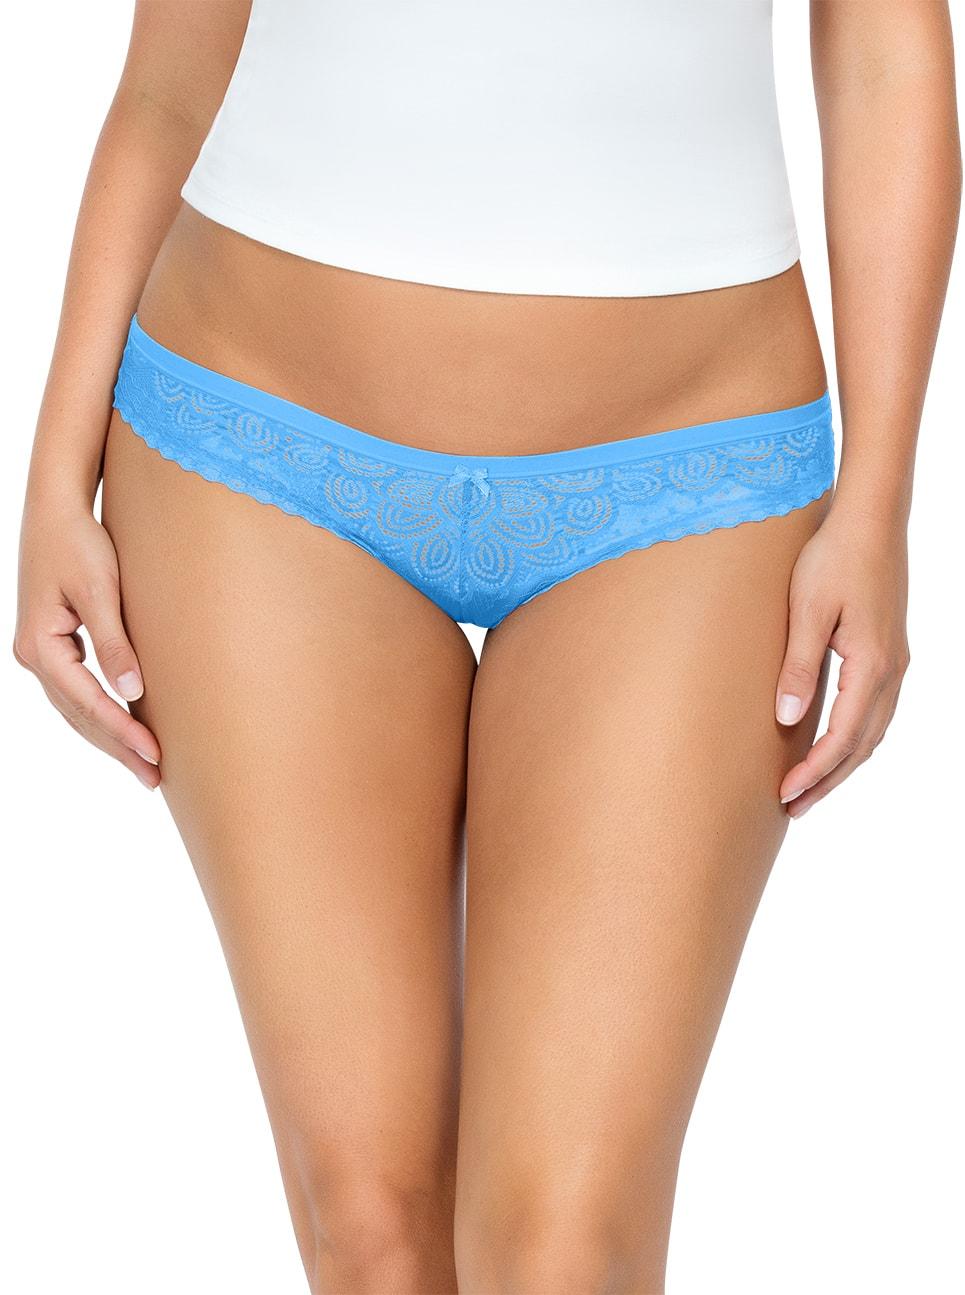 ParfaitPanty SoGlam BIKINIPP302 MediterraneanBlue FRONT - Parfait Panty So Glam Bikini - Mediterranean Blue - PP302